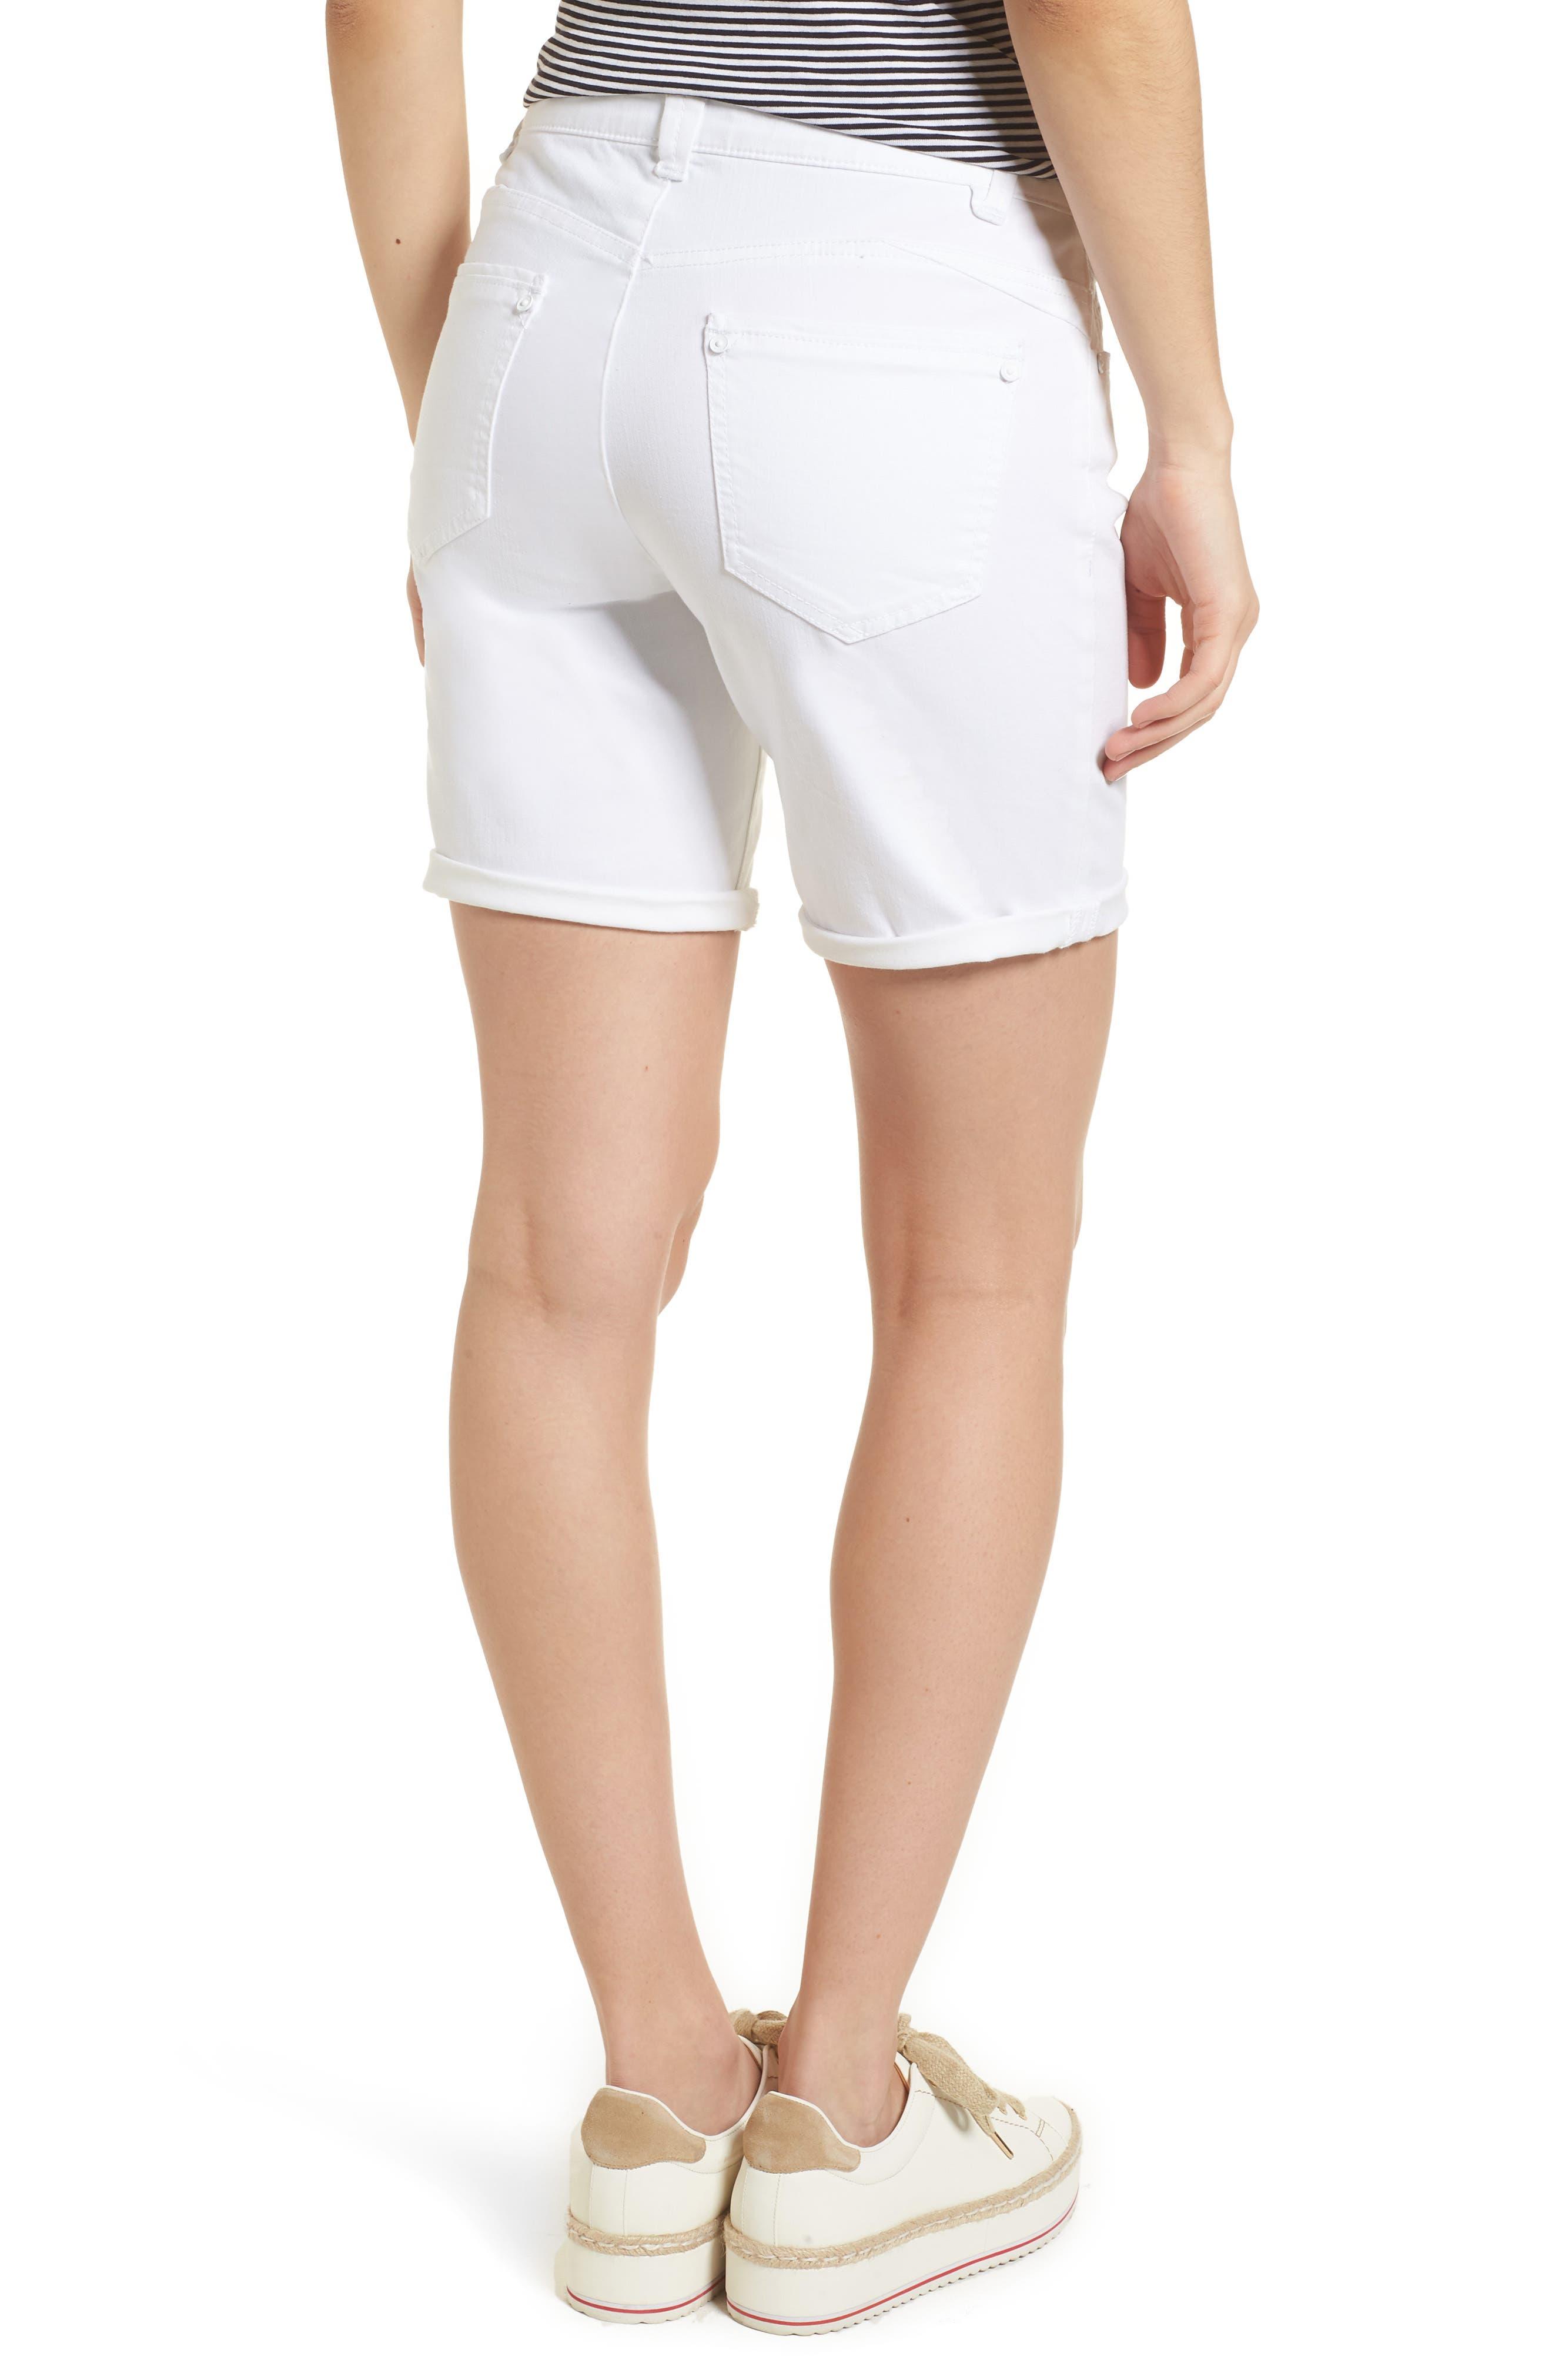 WIT & WISDOM, Ab-Solution White Denim Shorts, Alternate thumbnail 2, color, OPTIC WHITE